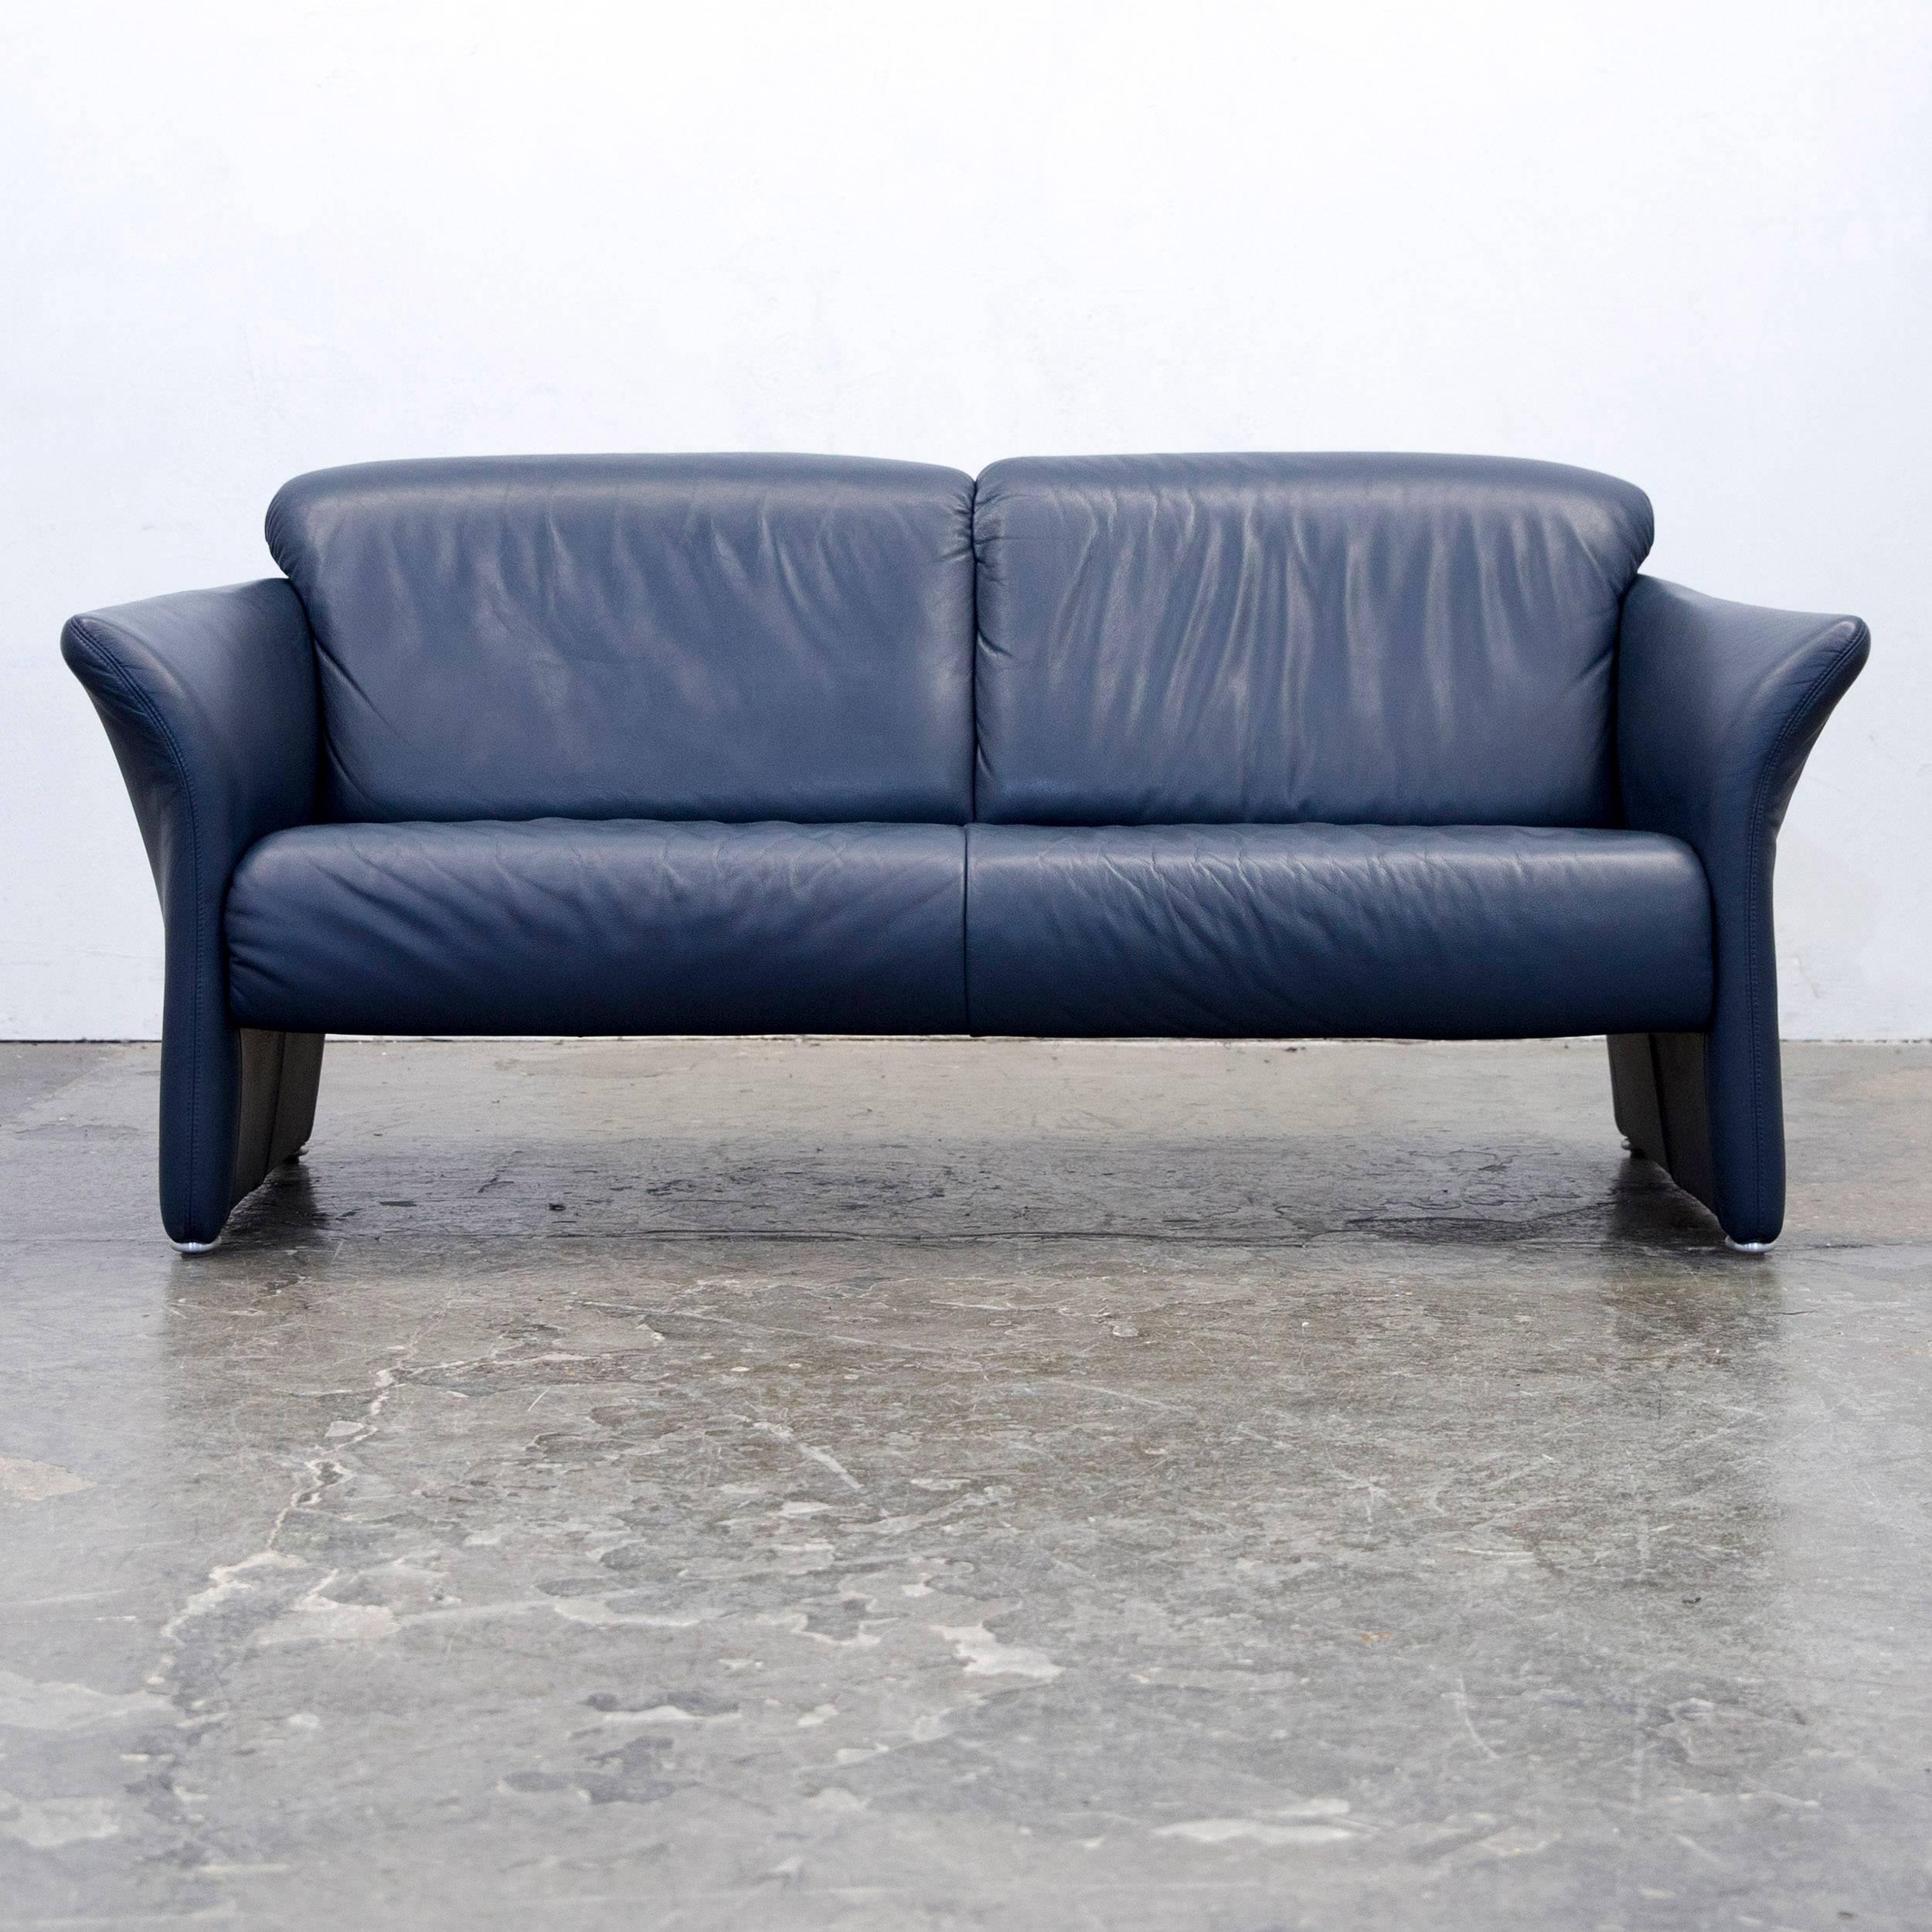 Blickfang Leder Sofa Garnitur Sammlung Von Koinor Designer Set Leather Dark Blue Two